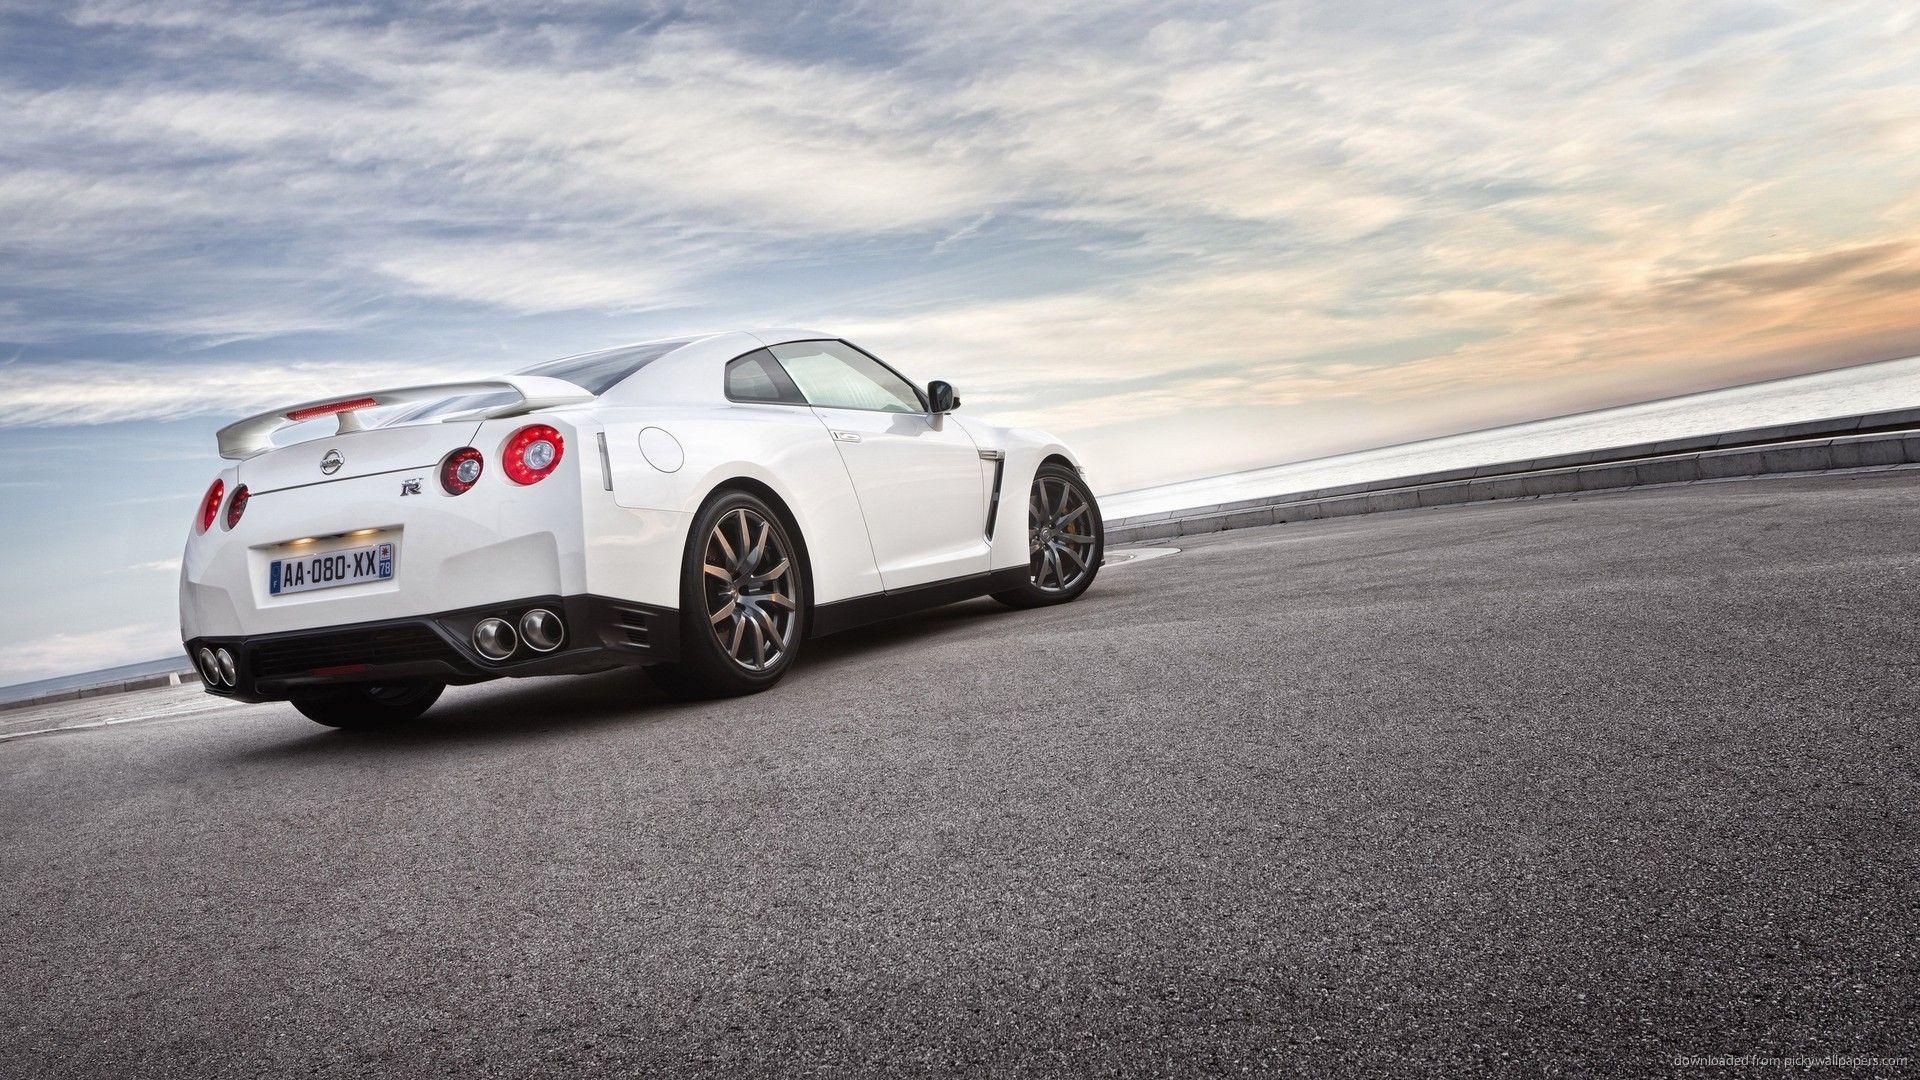 Nissan nissan deportivos nissan gt r nissan gt r r35 tuning cars - White Gtr Wallpaper High Quality Resolution Vln Cars Pinterest Wallpaper And Cars